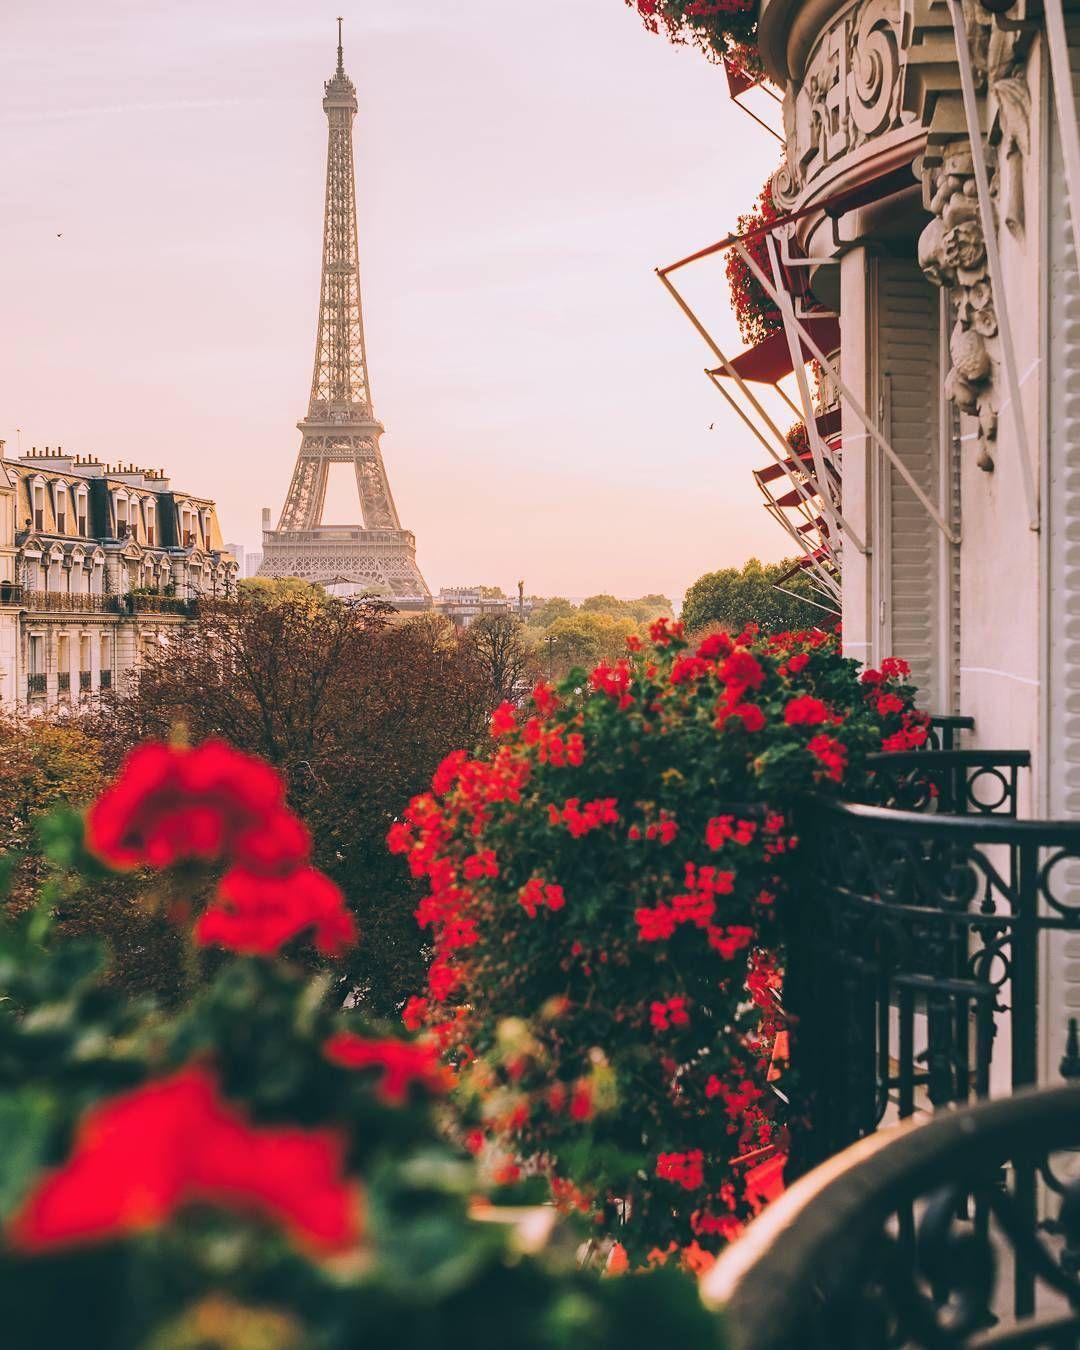 Paris Is The City Of Love And Romantic Design Discover The Most Unique Places With The Travel Guide At Mydesignagend Plaza Athenee Paris Paris Paris Wallpaper